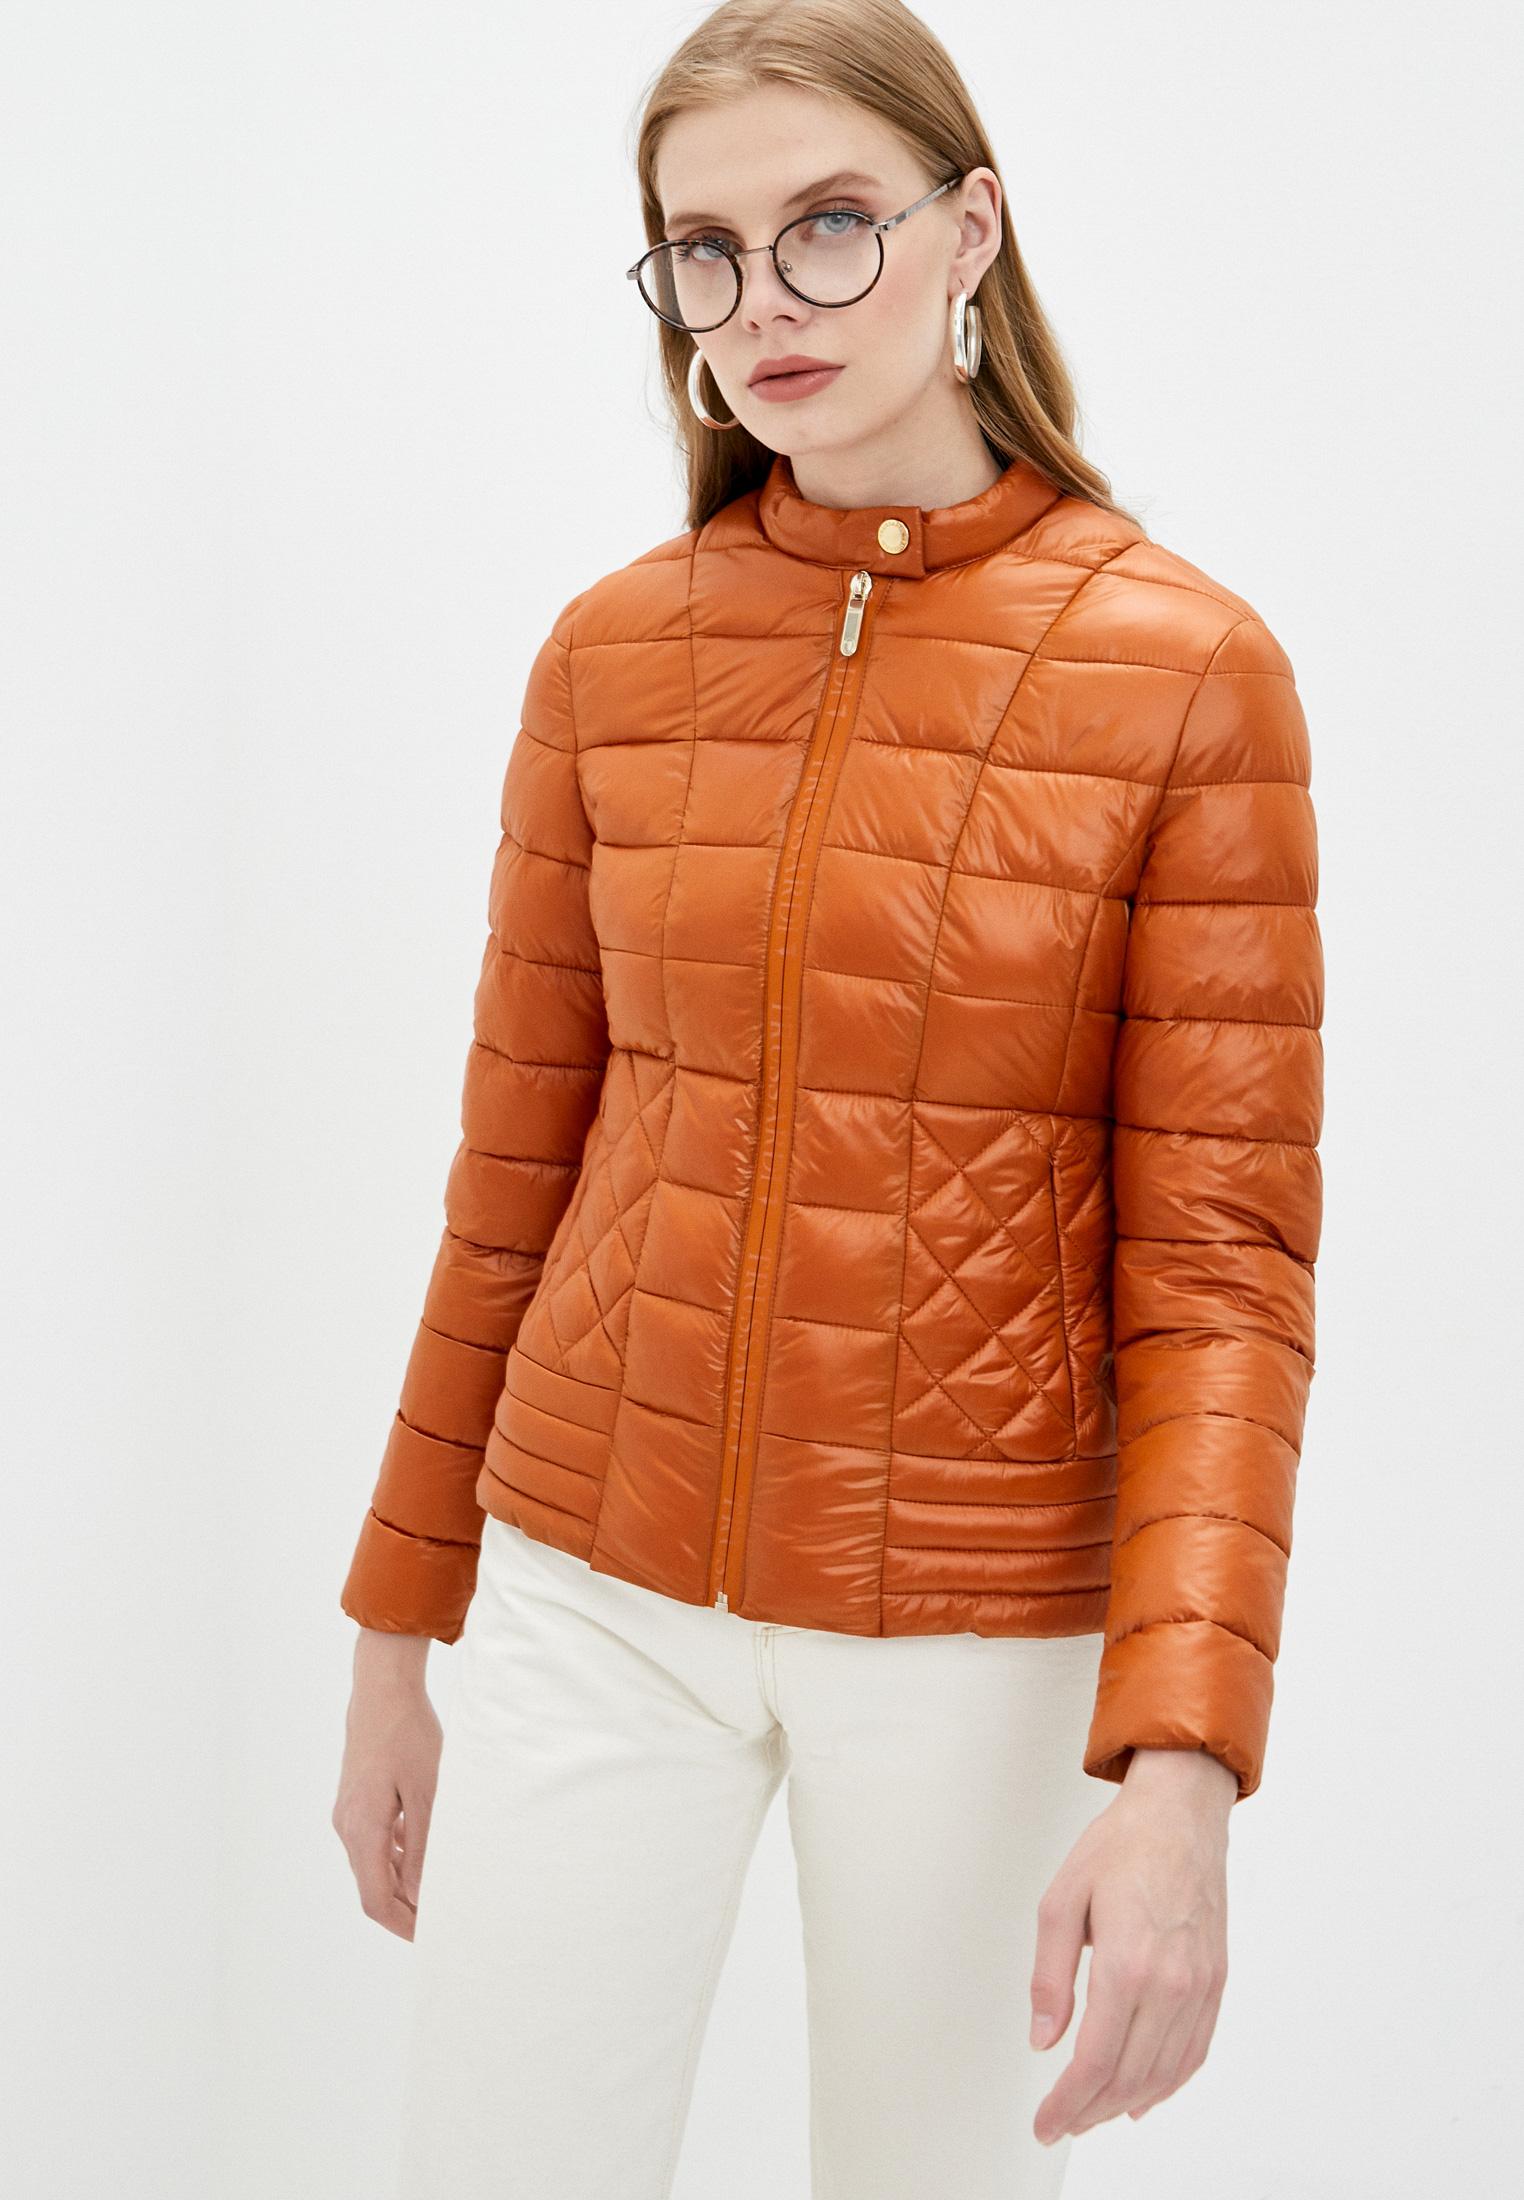 Утепленная куртка Trussardi (Труссарди) Куртка утепленная Trussardi